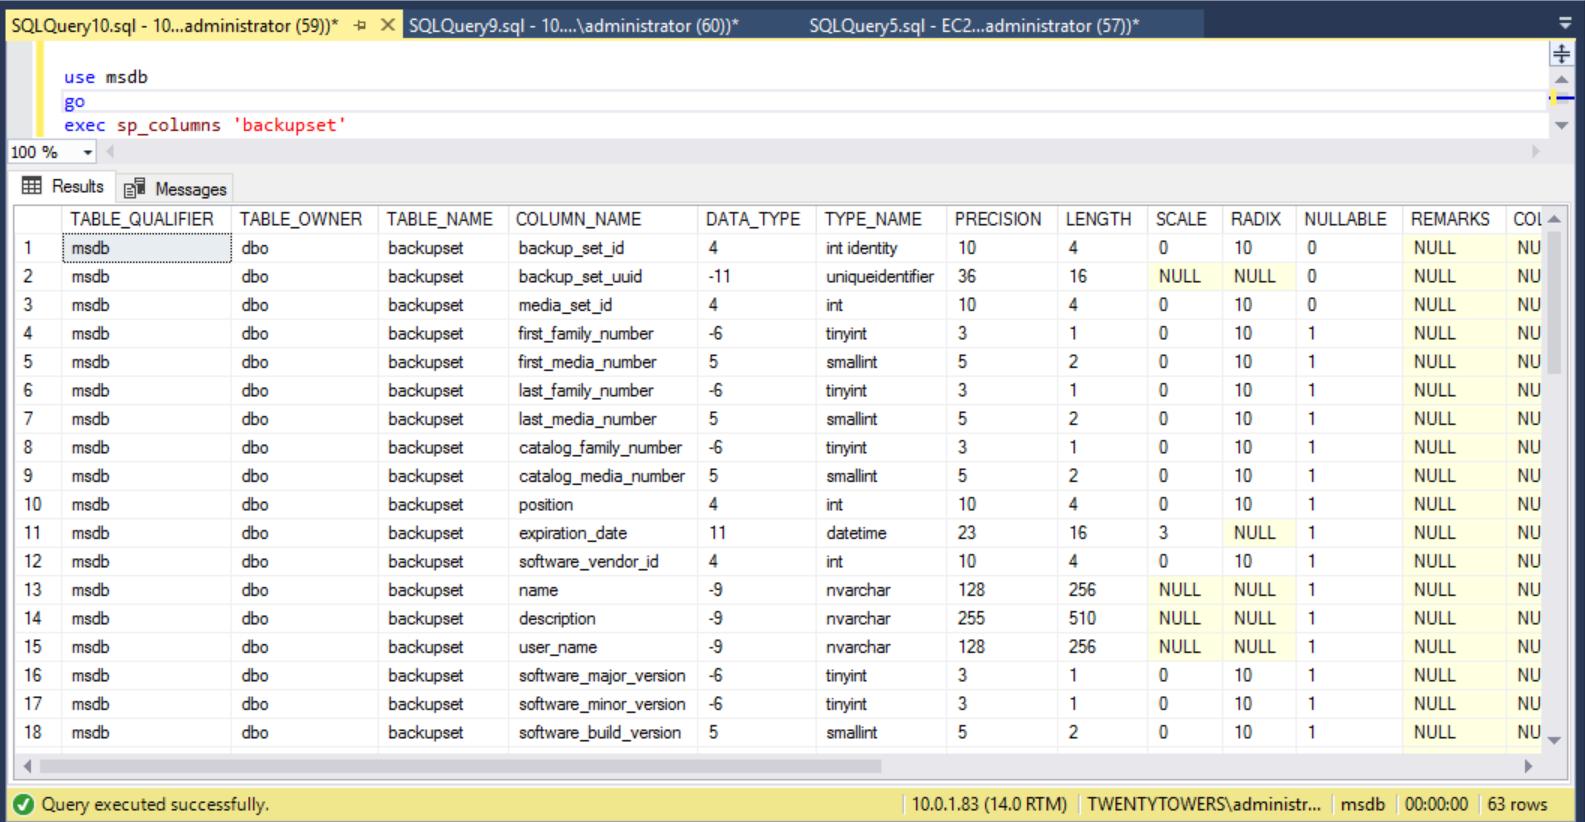 Describing msdb.dbo.backupset